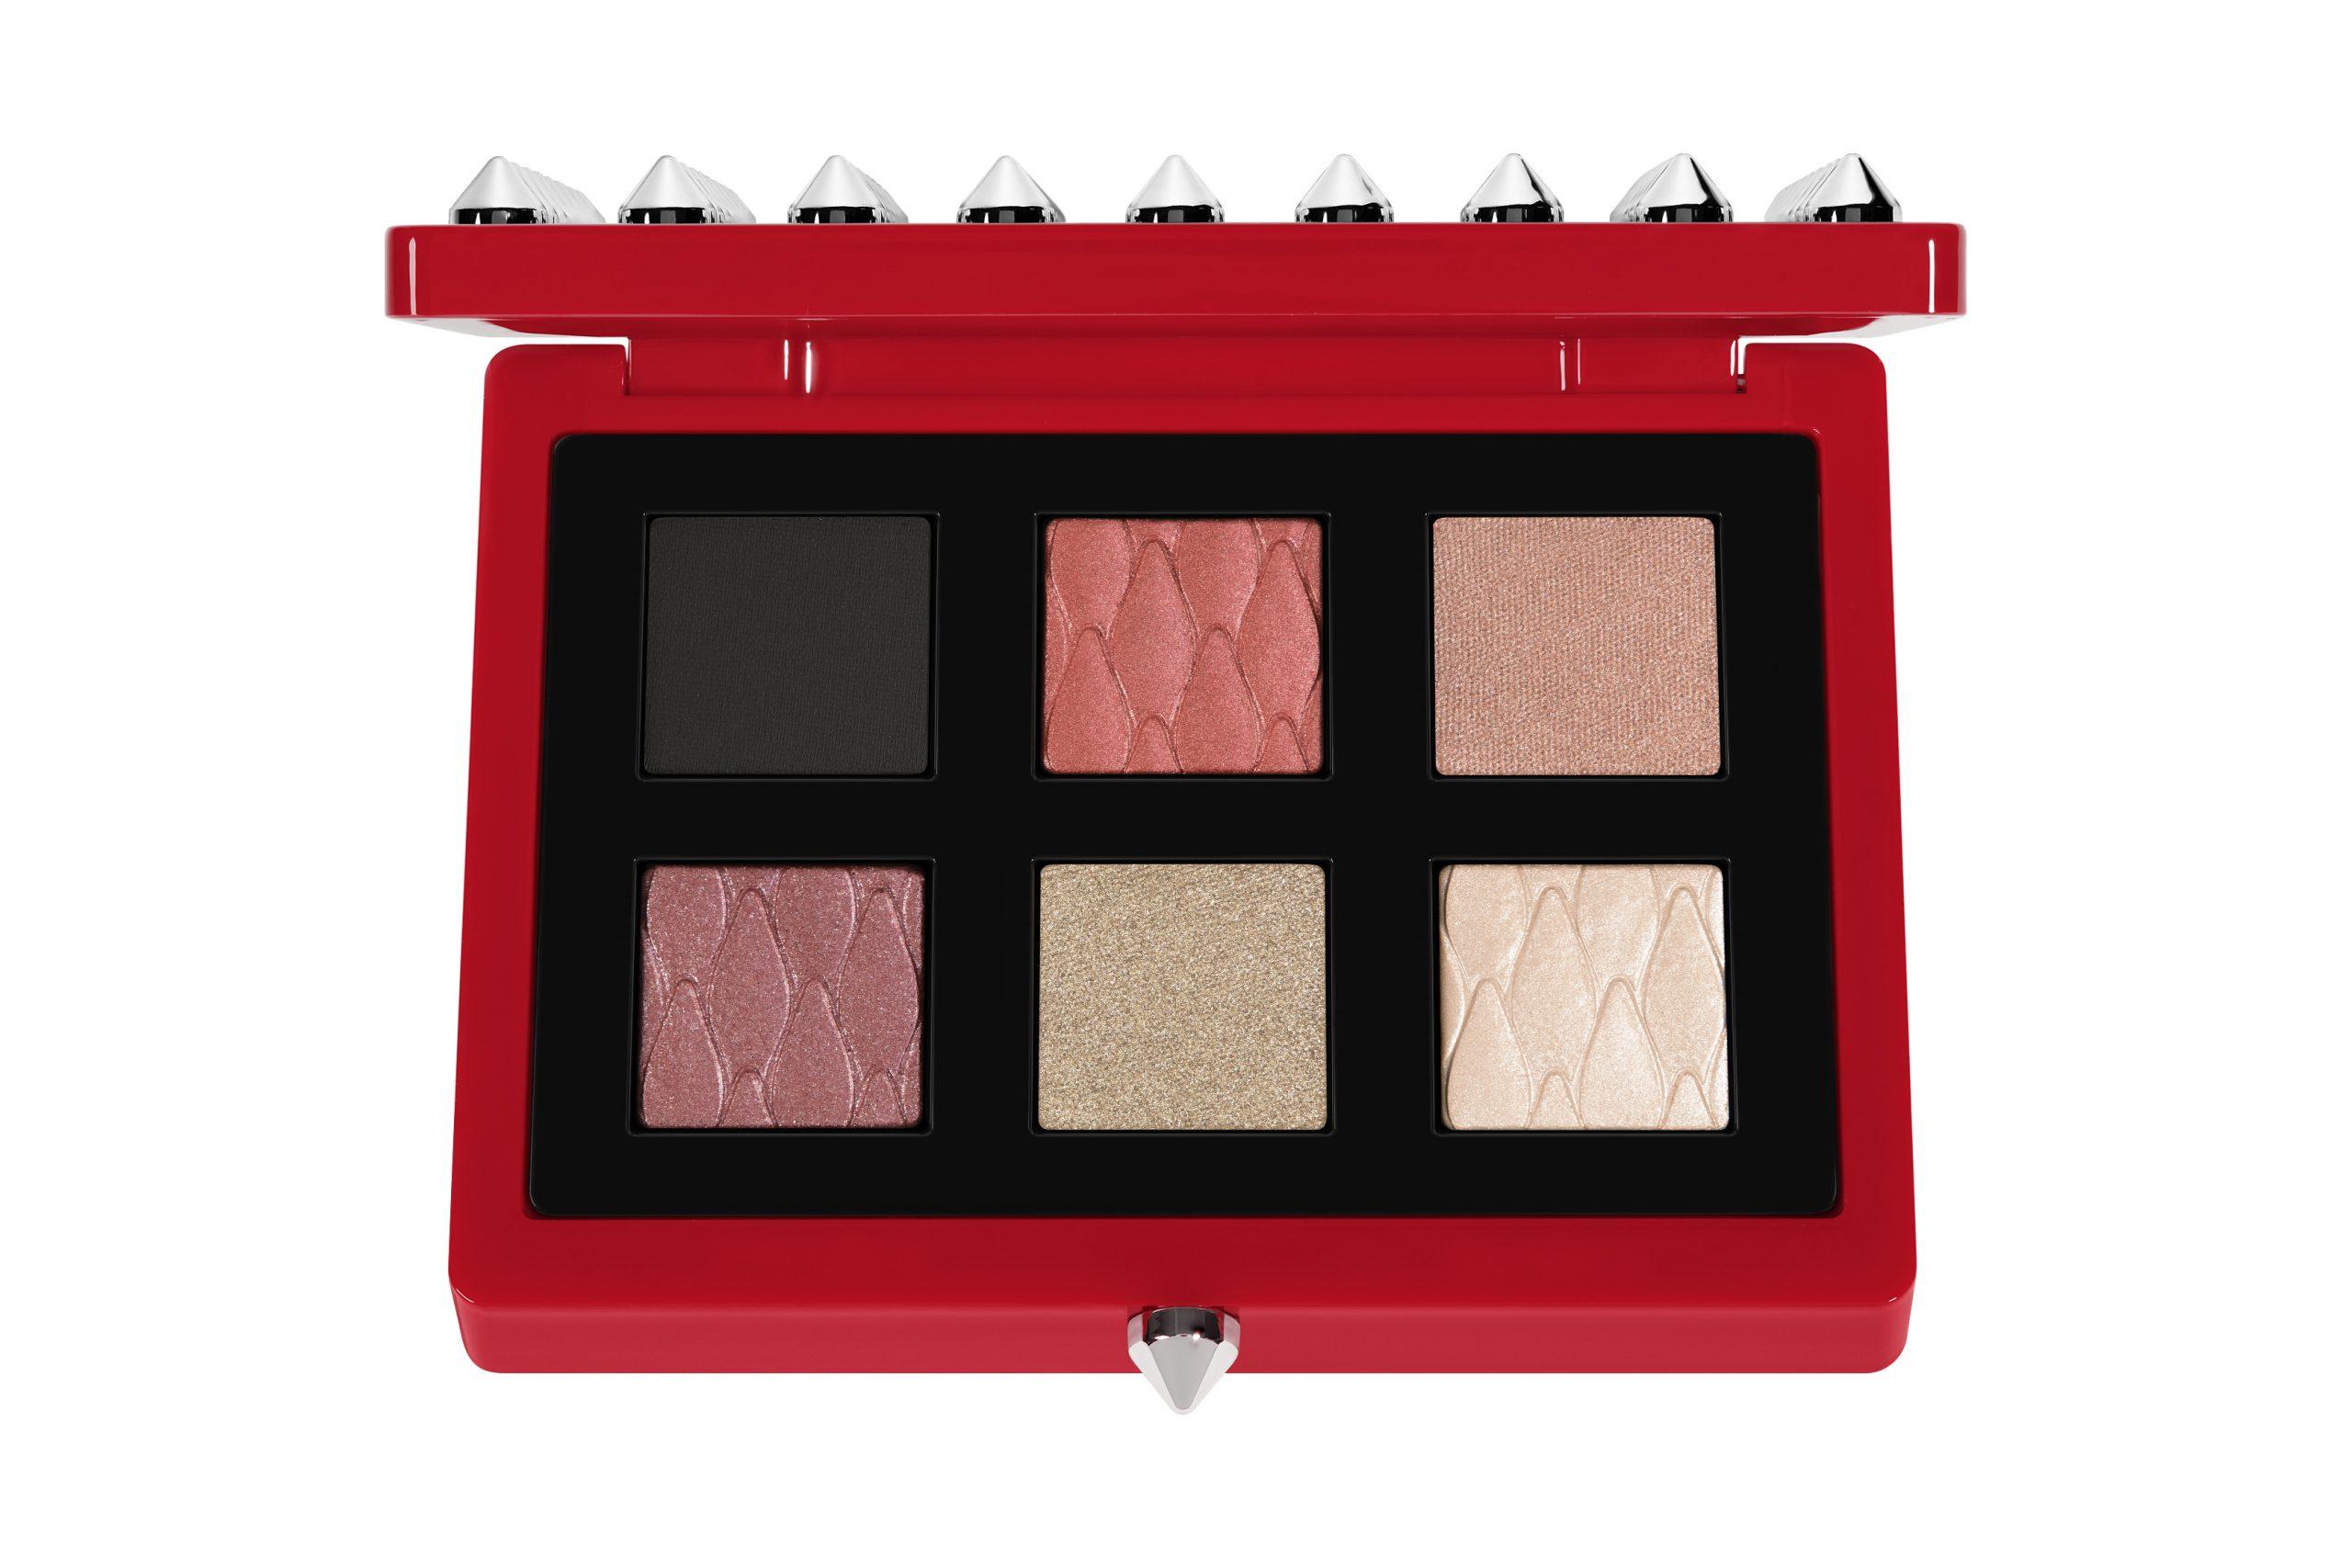 Christian Louboutin Beauty - nuovo makeup - Ph Courtesy Christian Louboutin Beauty